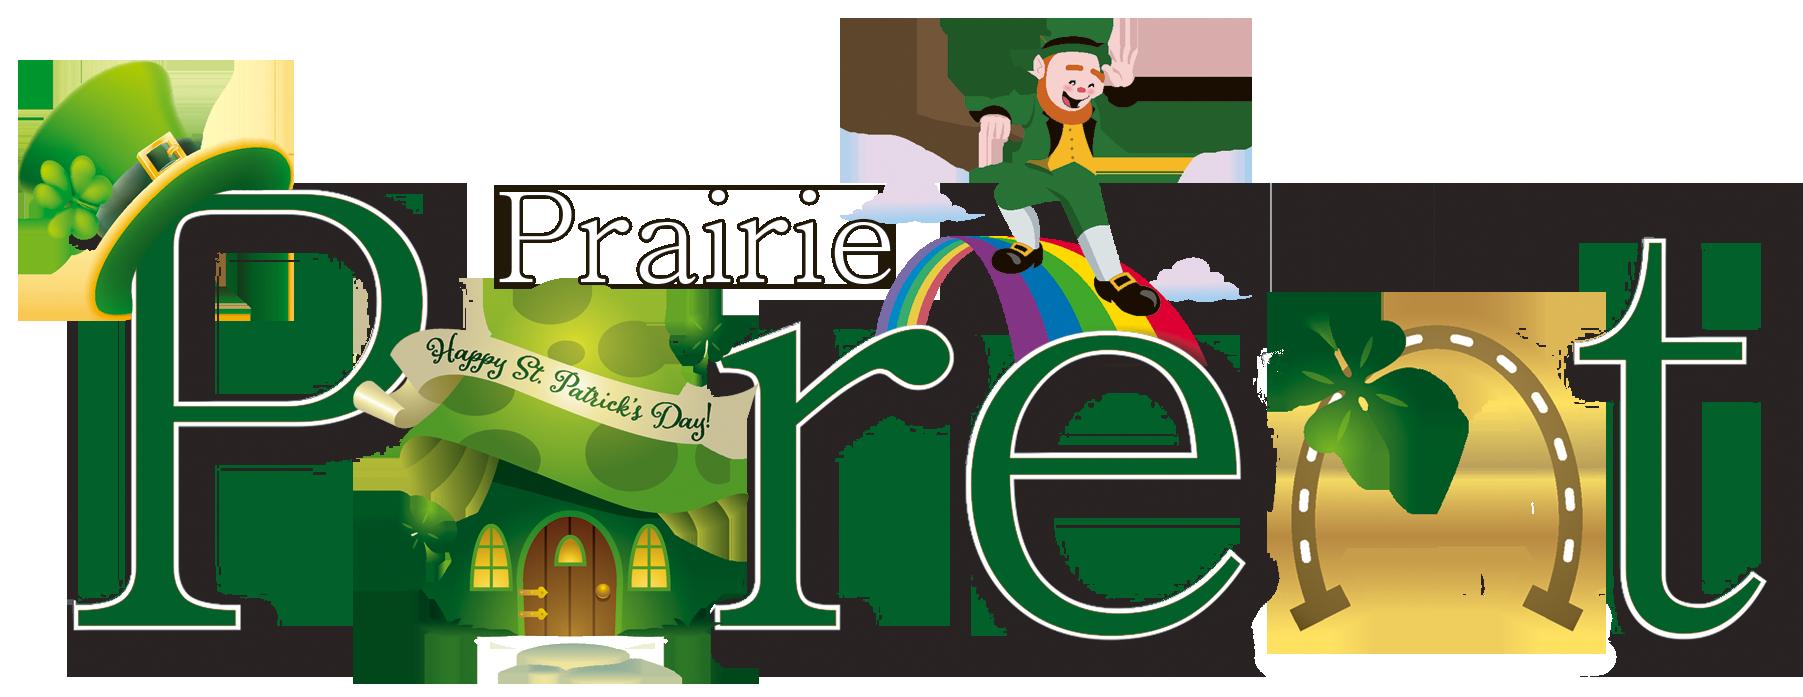 prairie-parent-march-logo-rgb-for-web-1